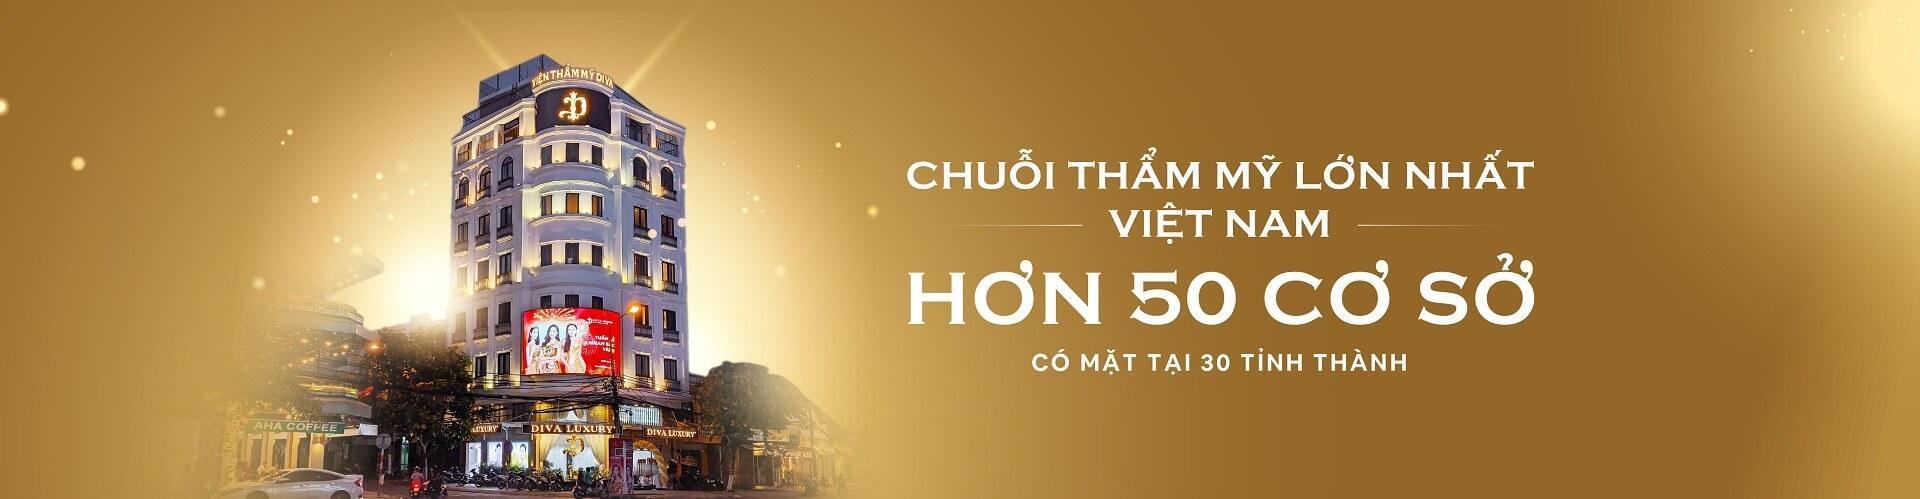 hon-50-co-so-vien-tham-my-diva-2